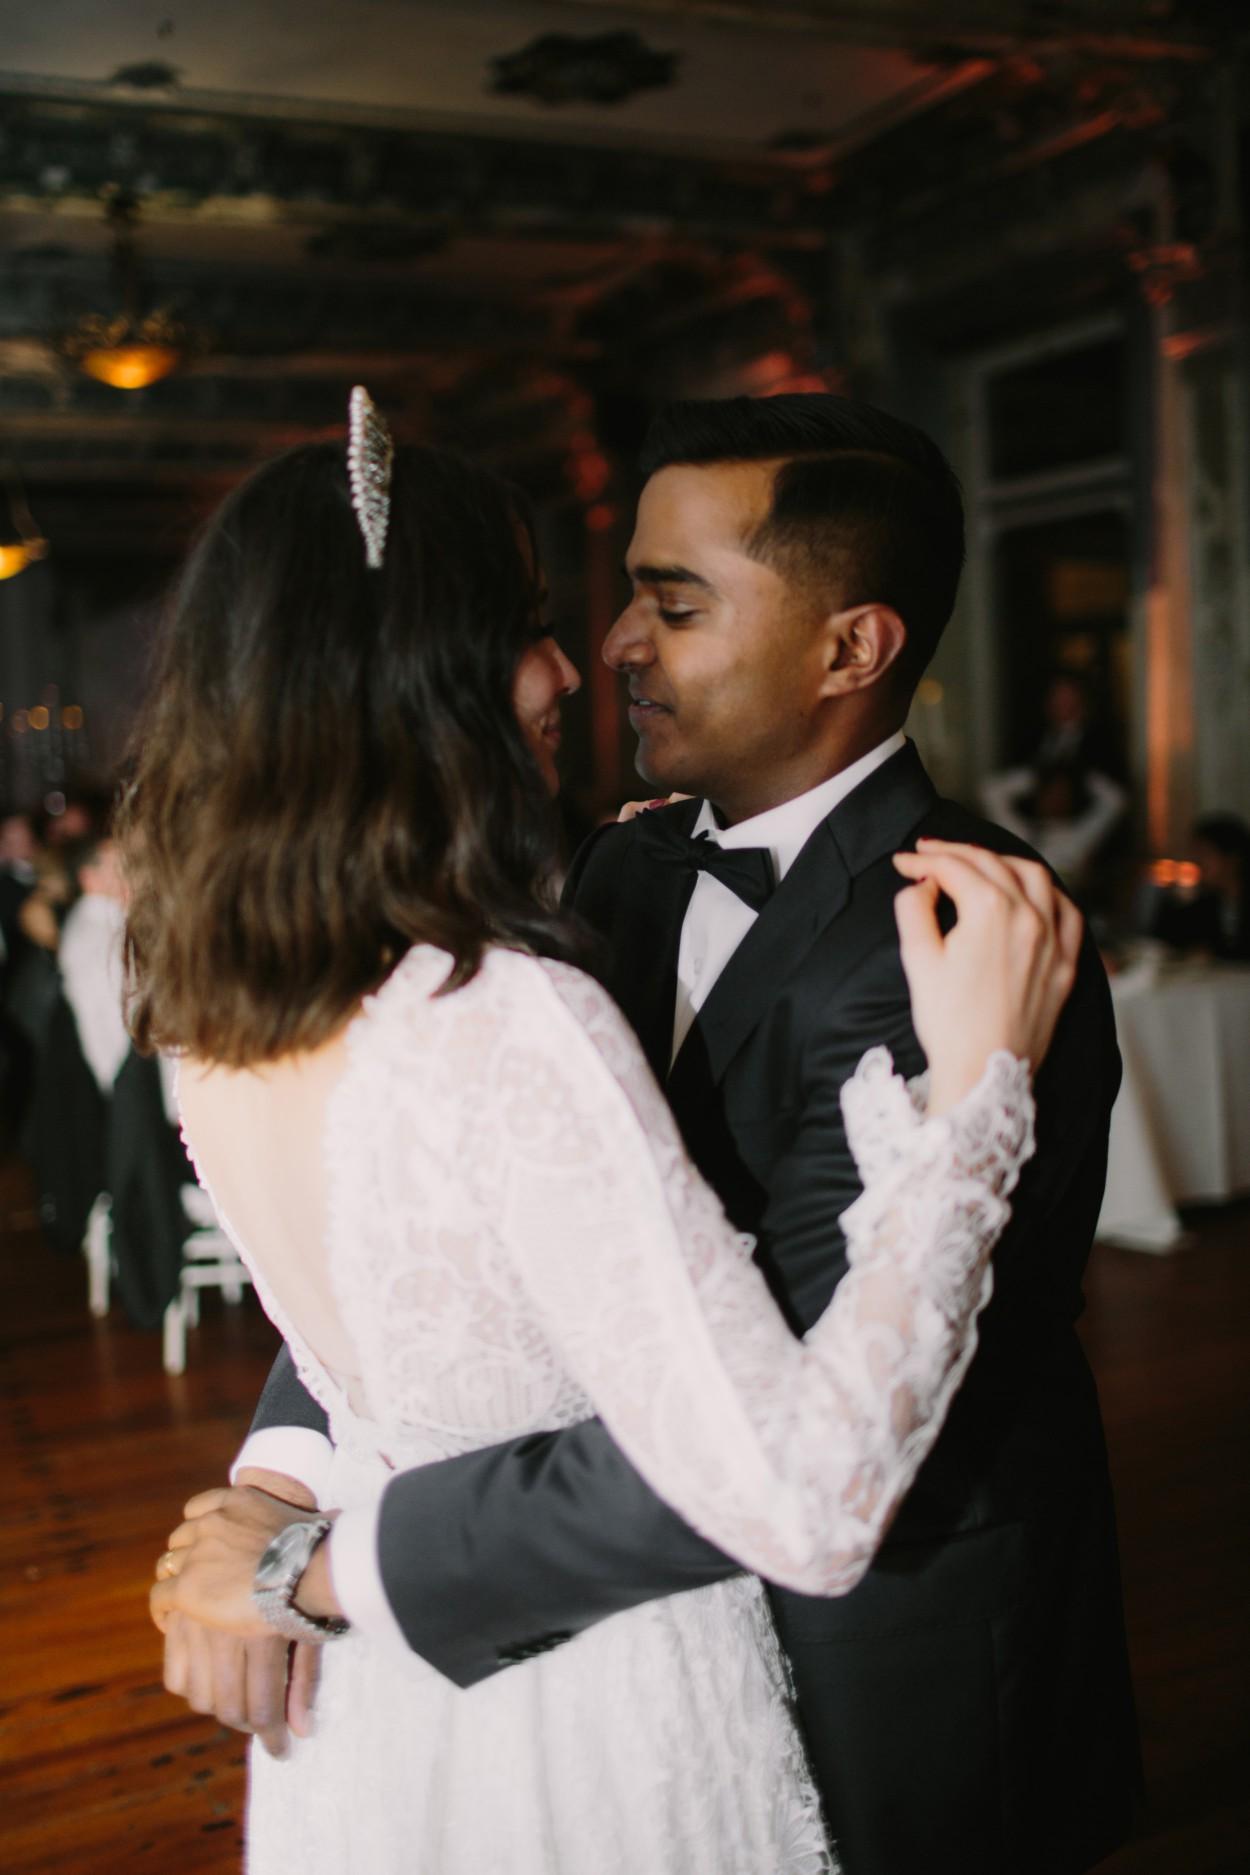 I-Got-You-Babe-Weddings-The-131George-Ballroom-St-Kilda-Wedding-Amy-Abhi.jpg